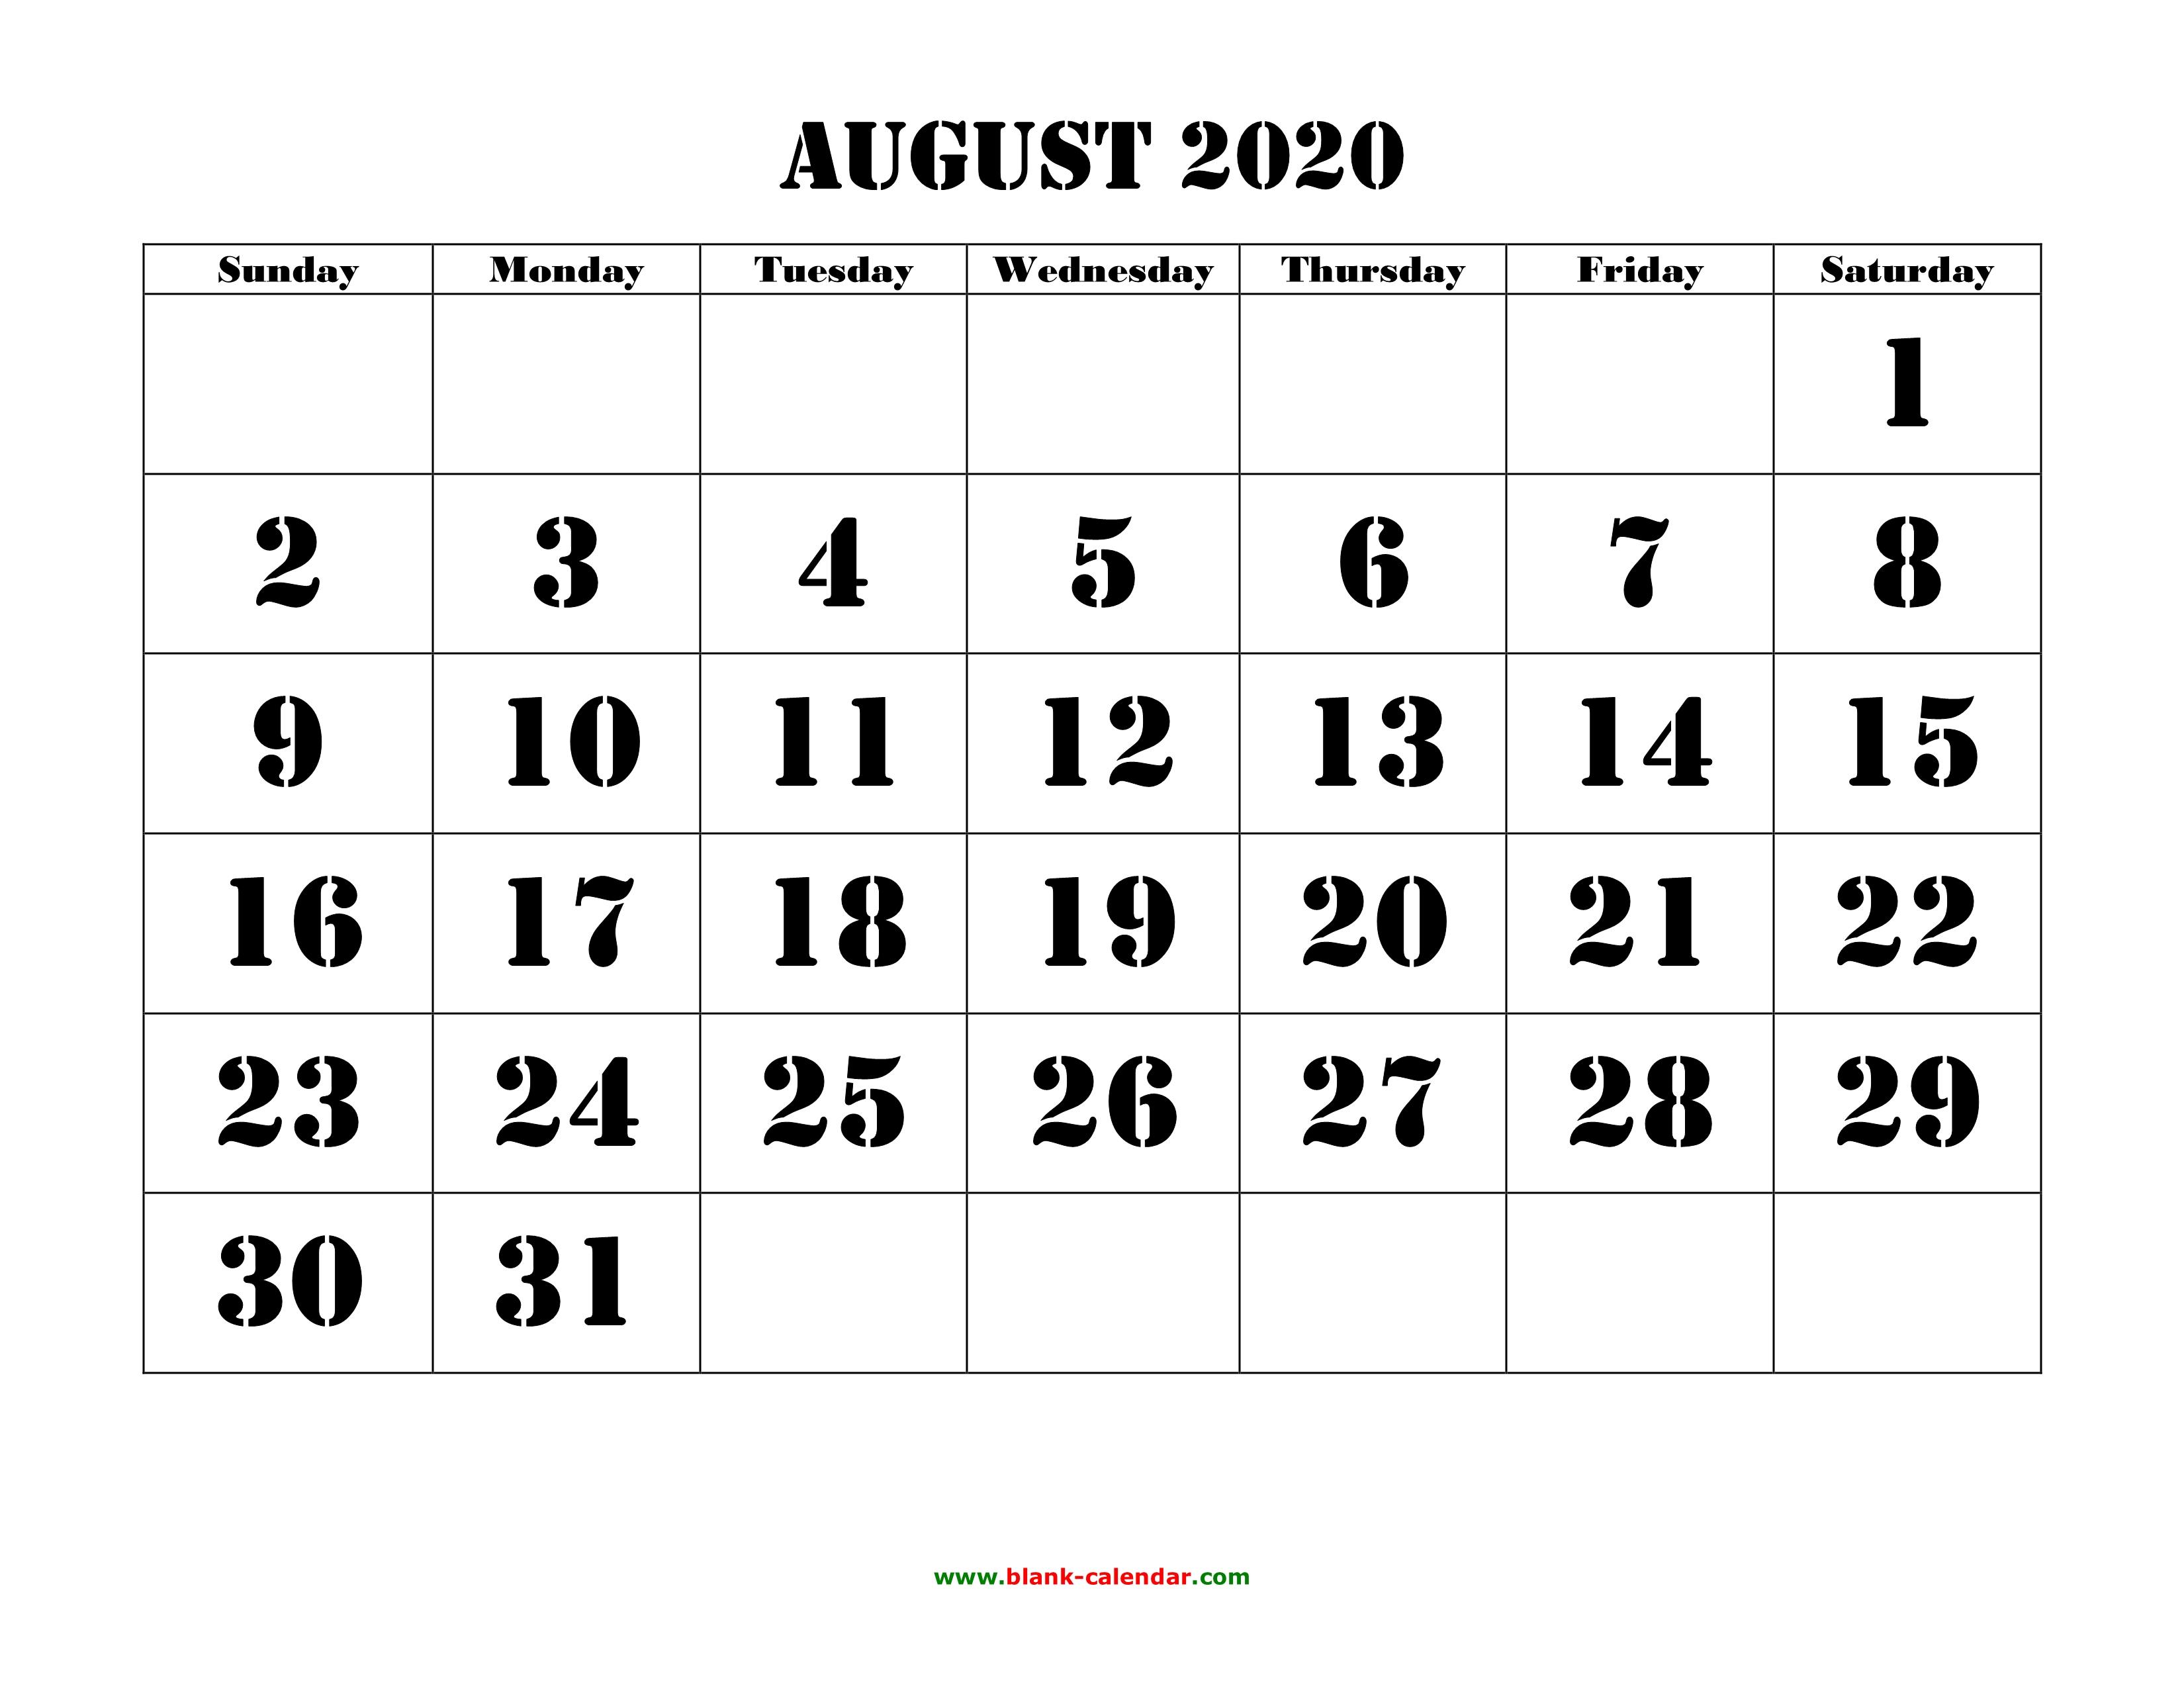 Free Download Printable August 2020 Calendar, Large Font